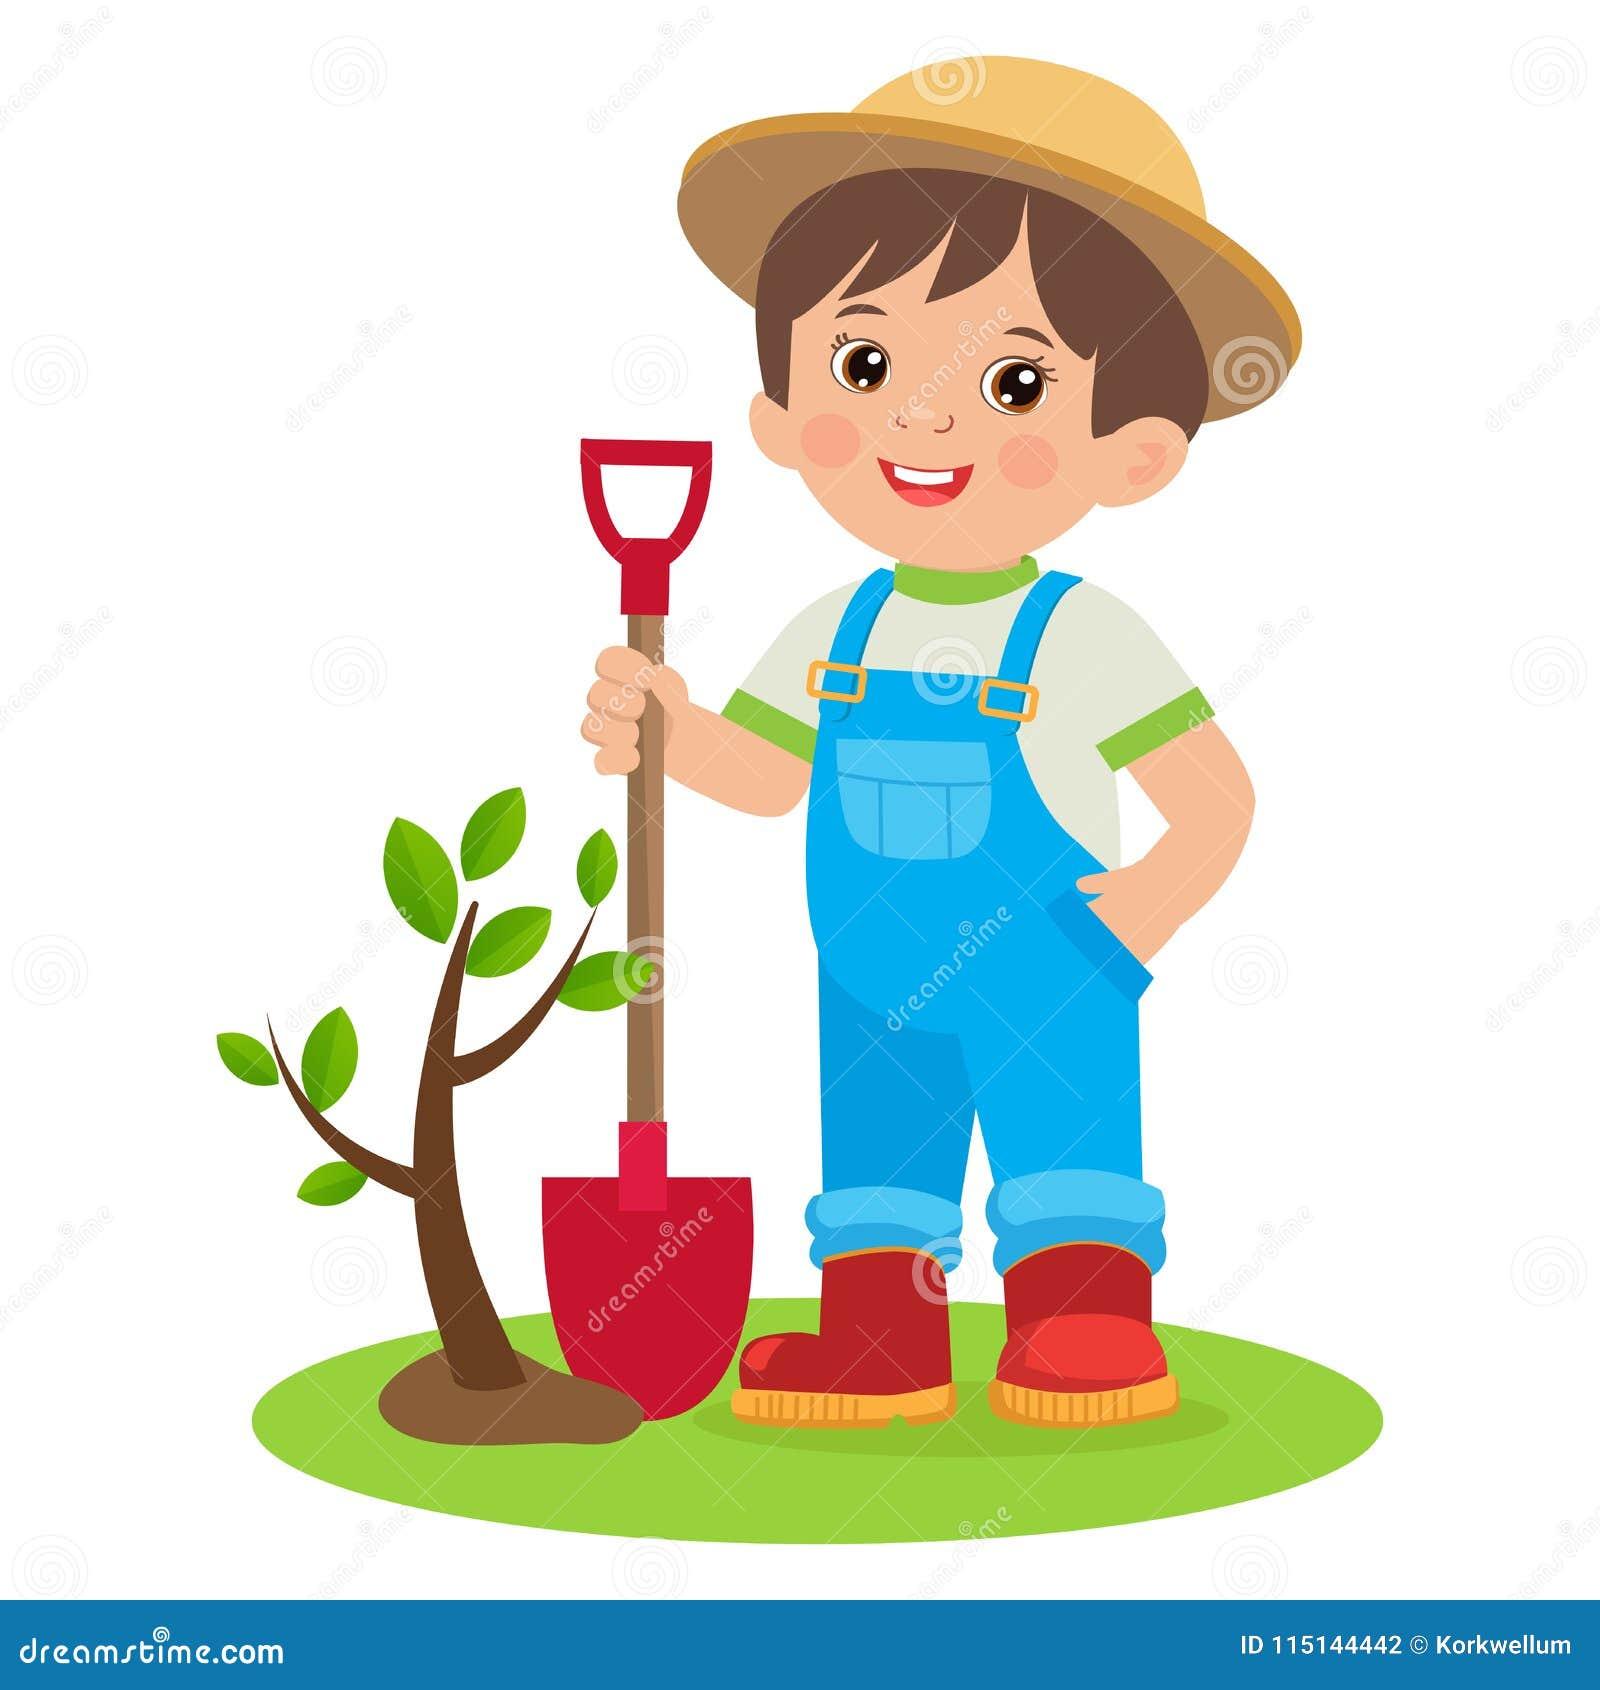 Garden Cute Cartoon: Spring Gardening. Growing Young Gardener. Cute Cartoon Boy